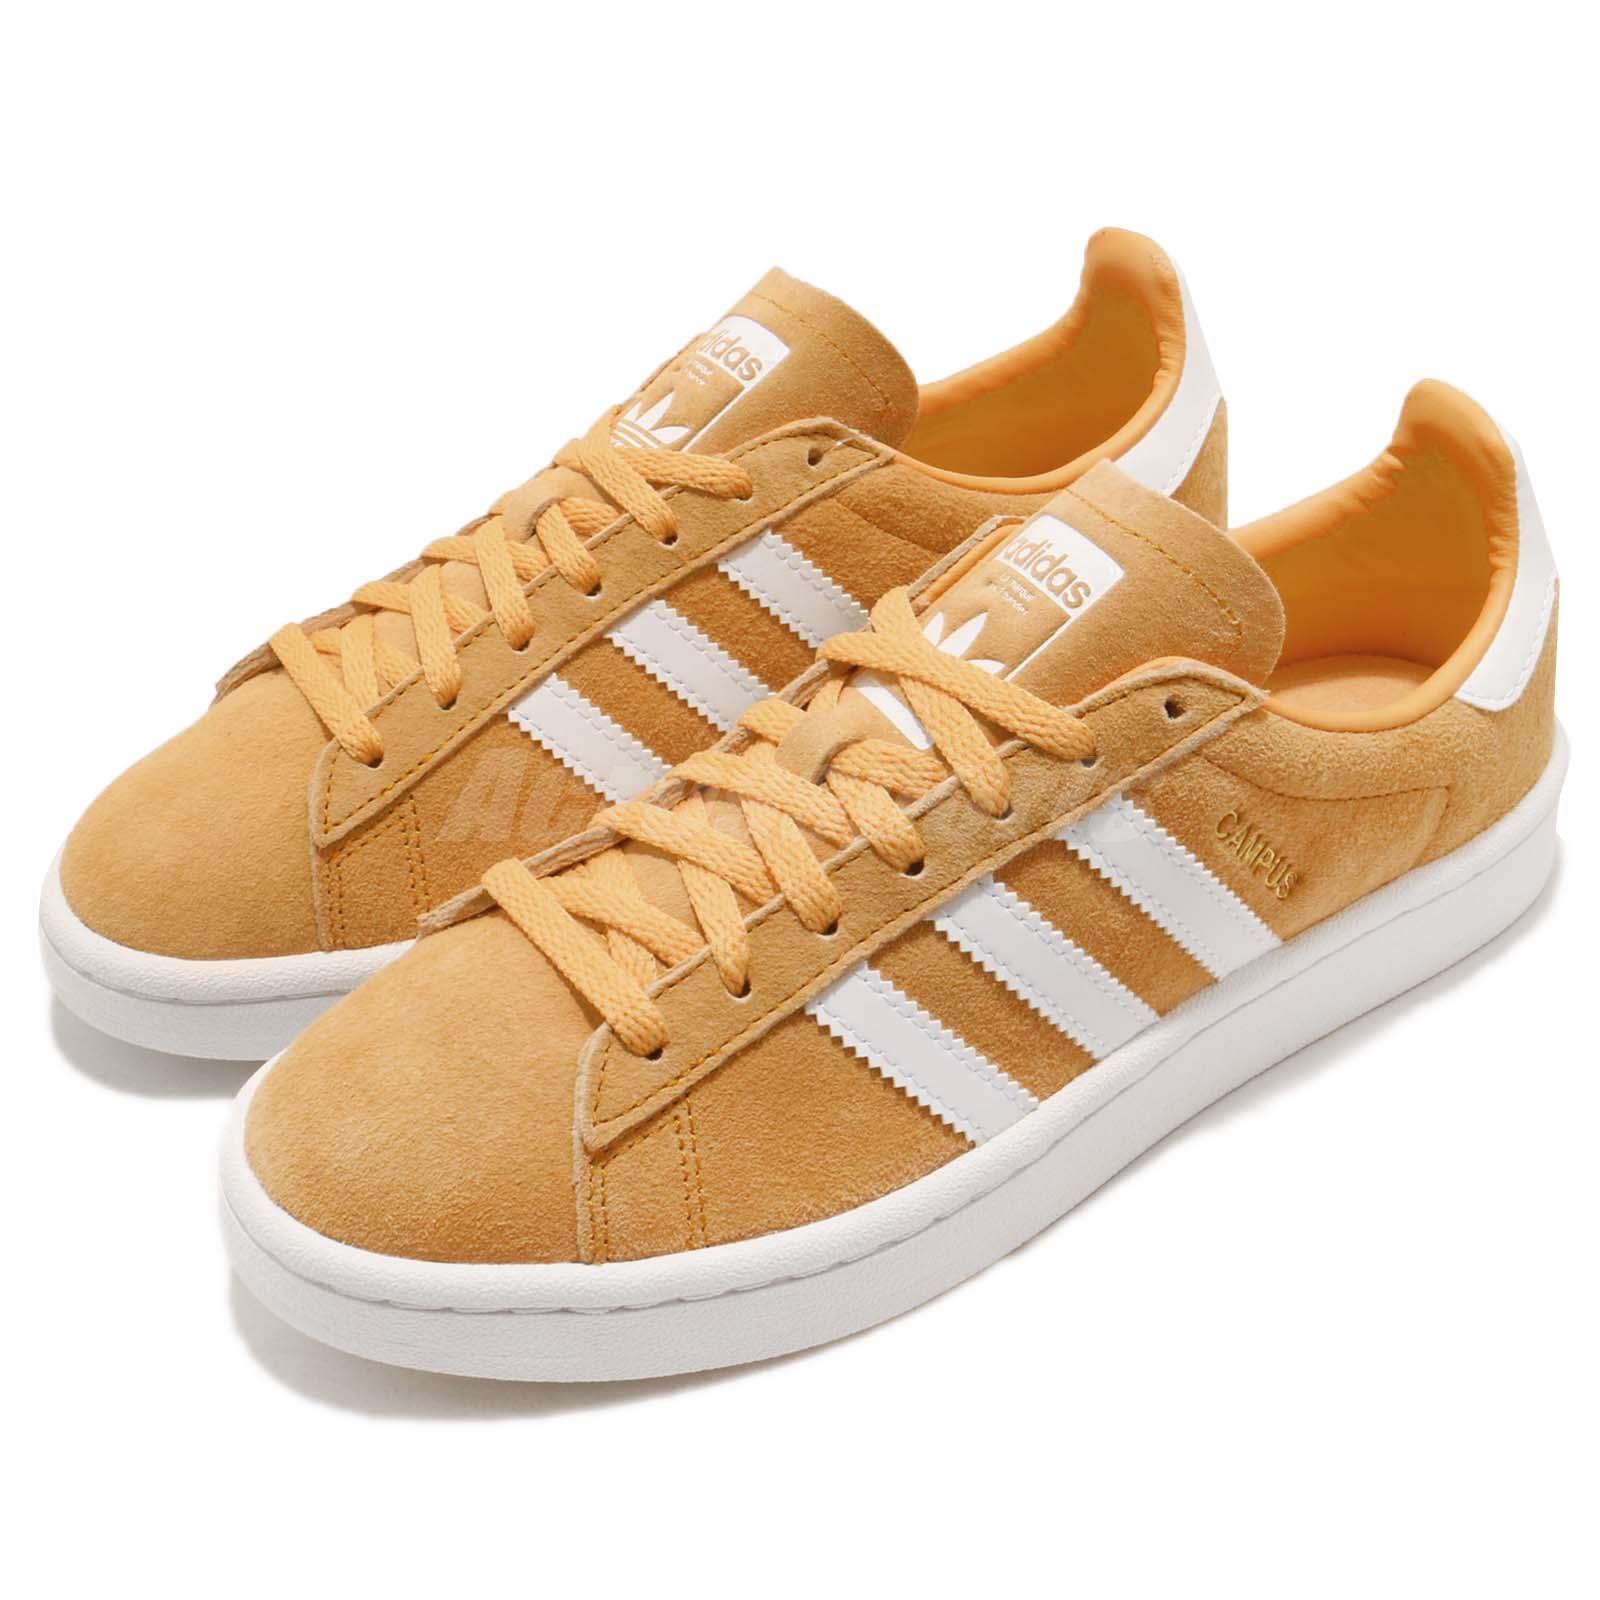 adidas Originals Campus W Chalk Orange White Women Casual Casual Casual Shoes Sneakers AQ1071 dd5959